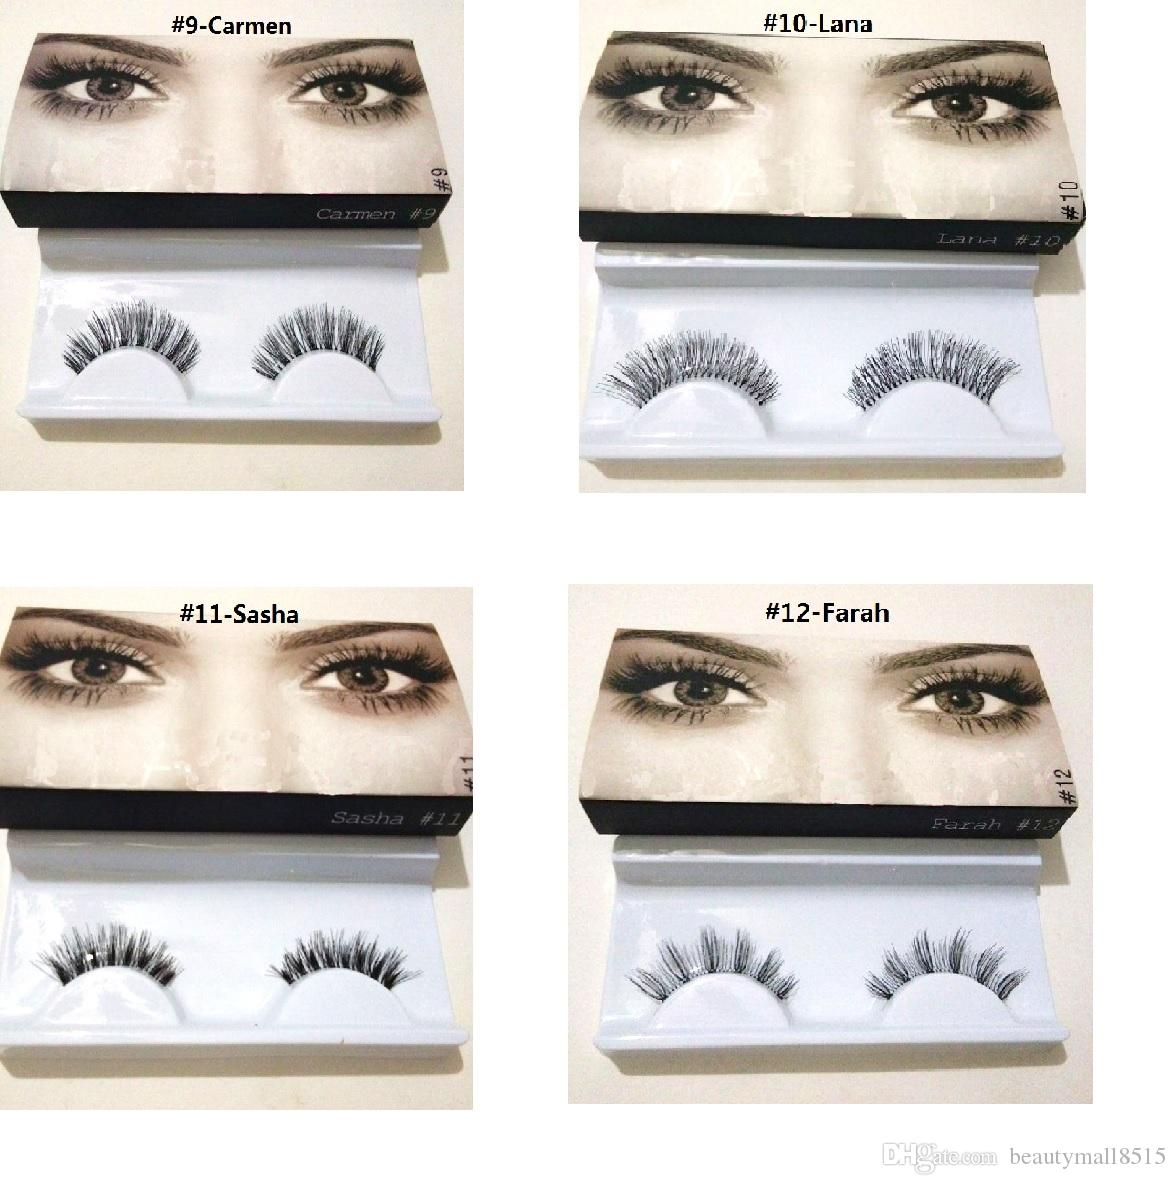 Hot Selling New False Eyelashes 20 types boxed Best Handmade 3D Eye Lash Extensions Natural Synthetic Eyelash Fibers Makeup